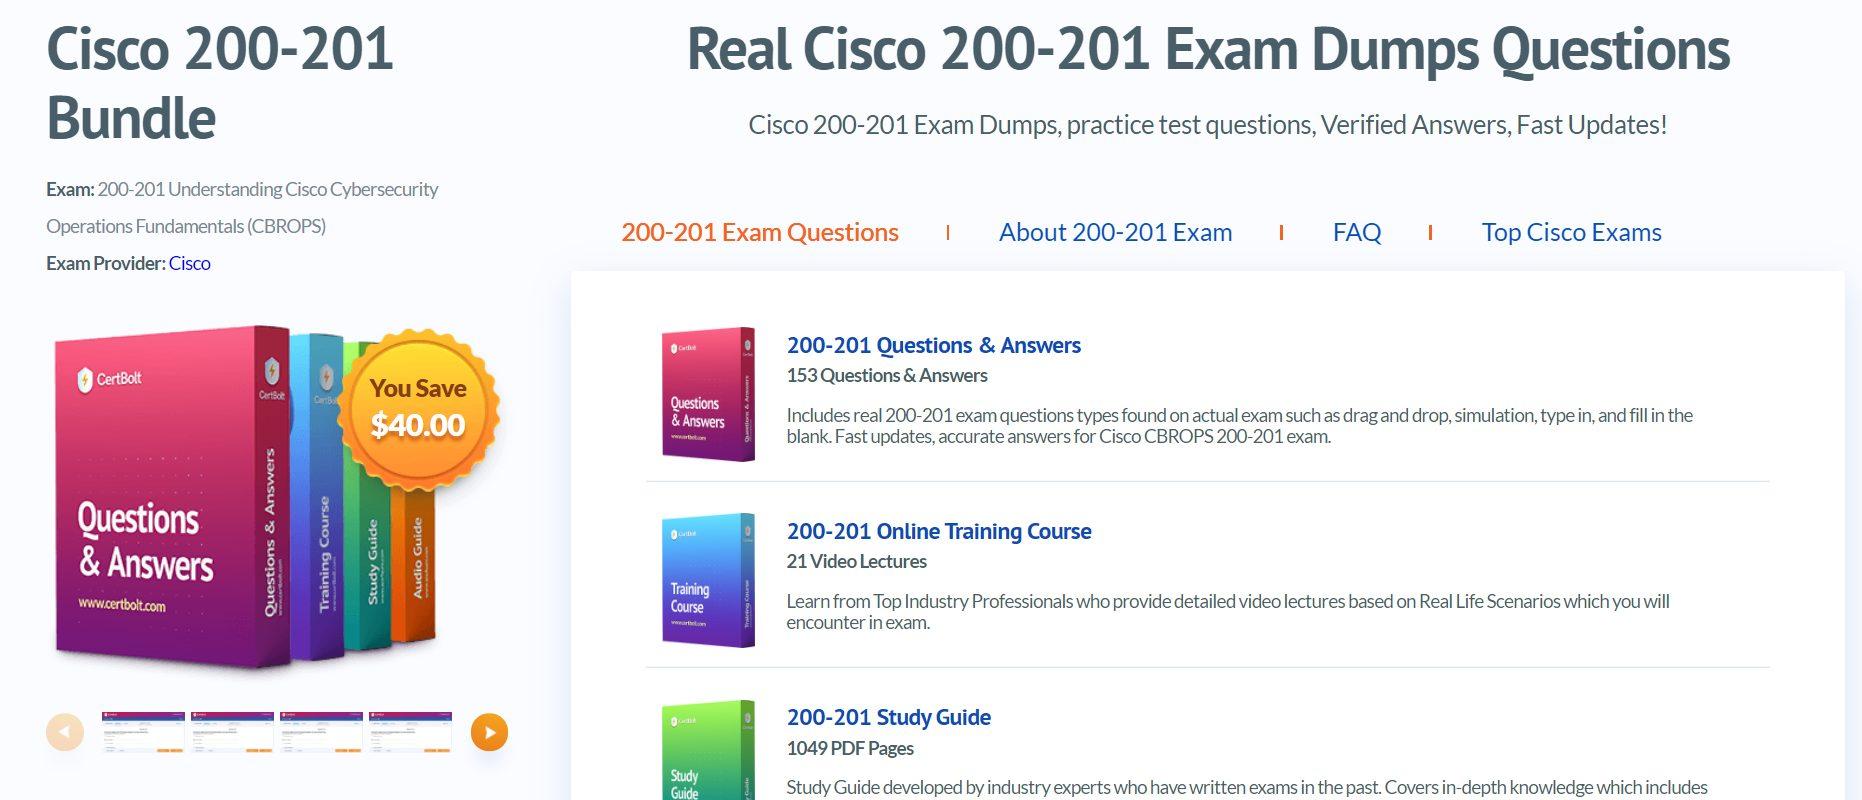 Explore Certbolt Cisco 200-201 CBROPS Exam Topics